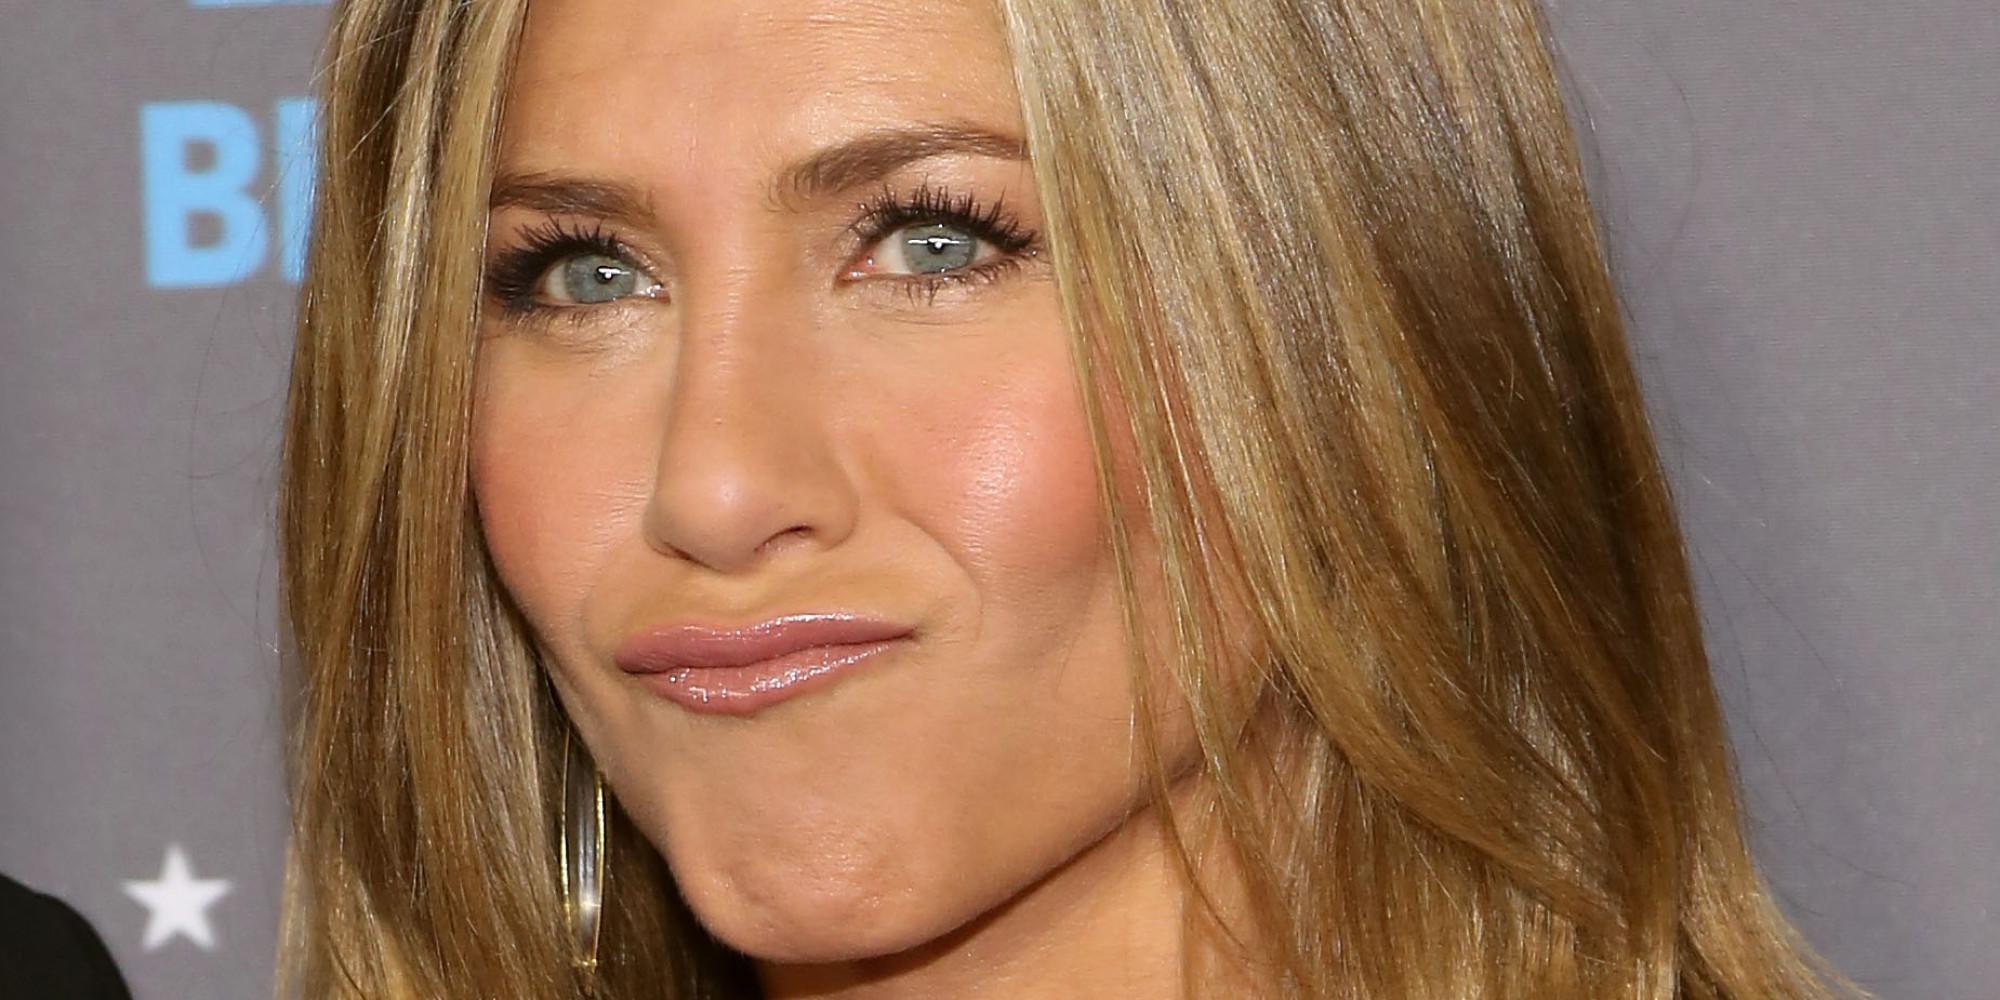 Huffington post no makeup selfie celebrity